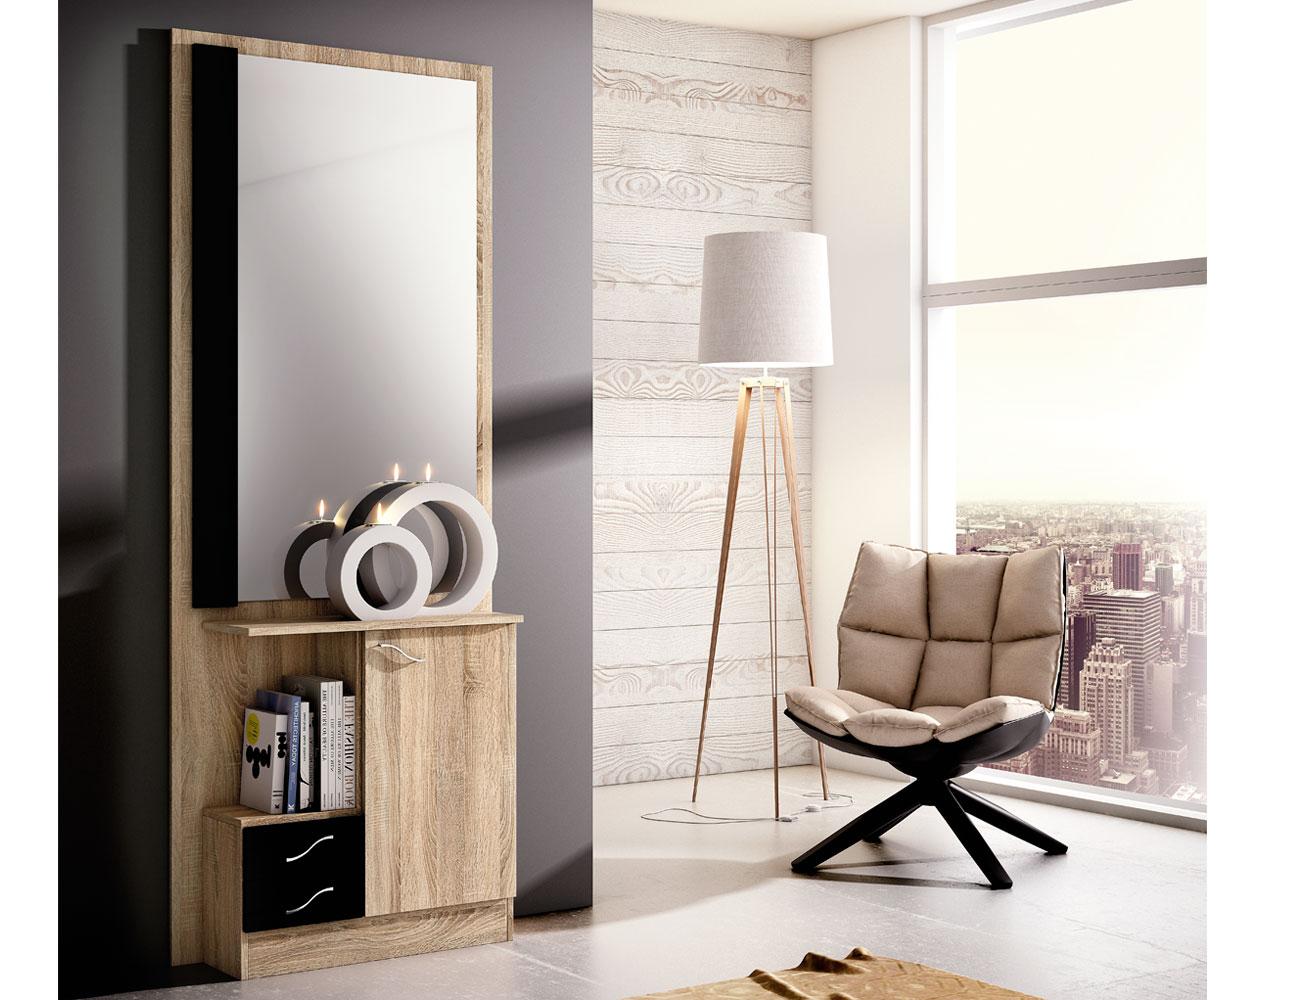 Recibidor con mural espejo 2 cajones cambrian negro 150